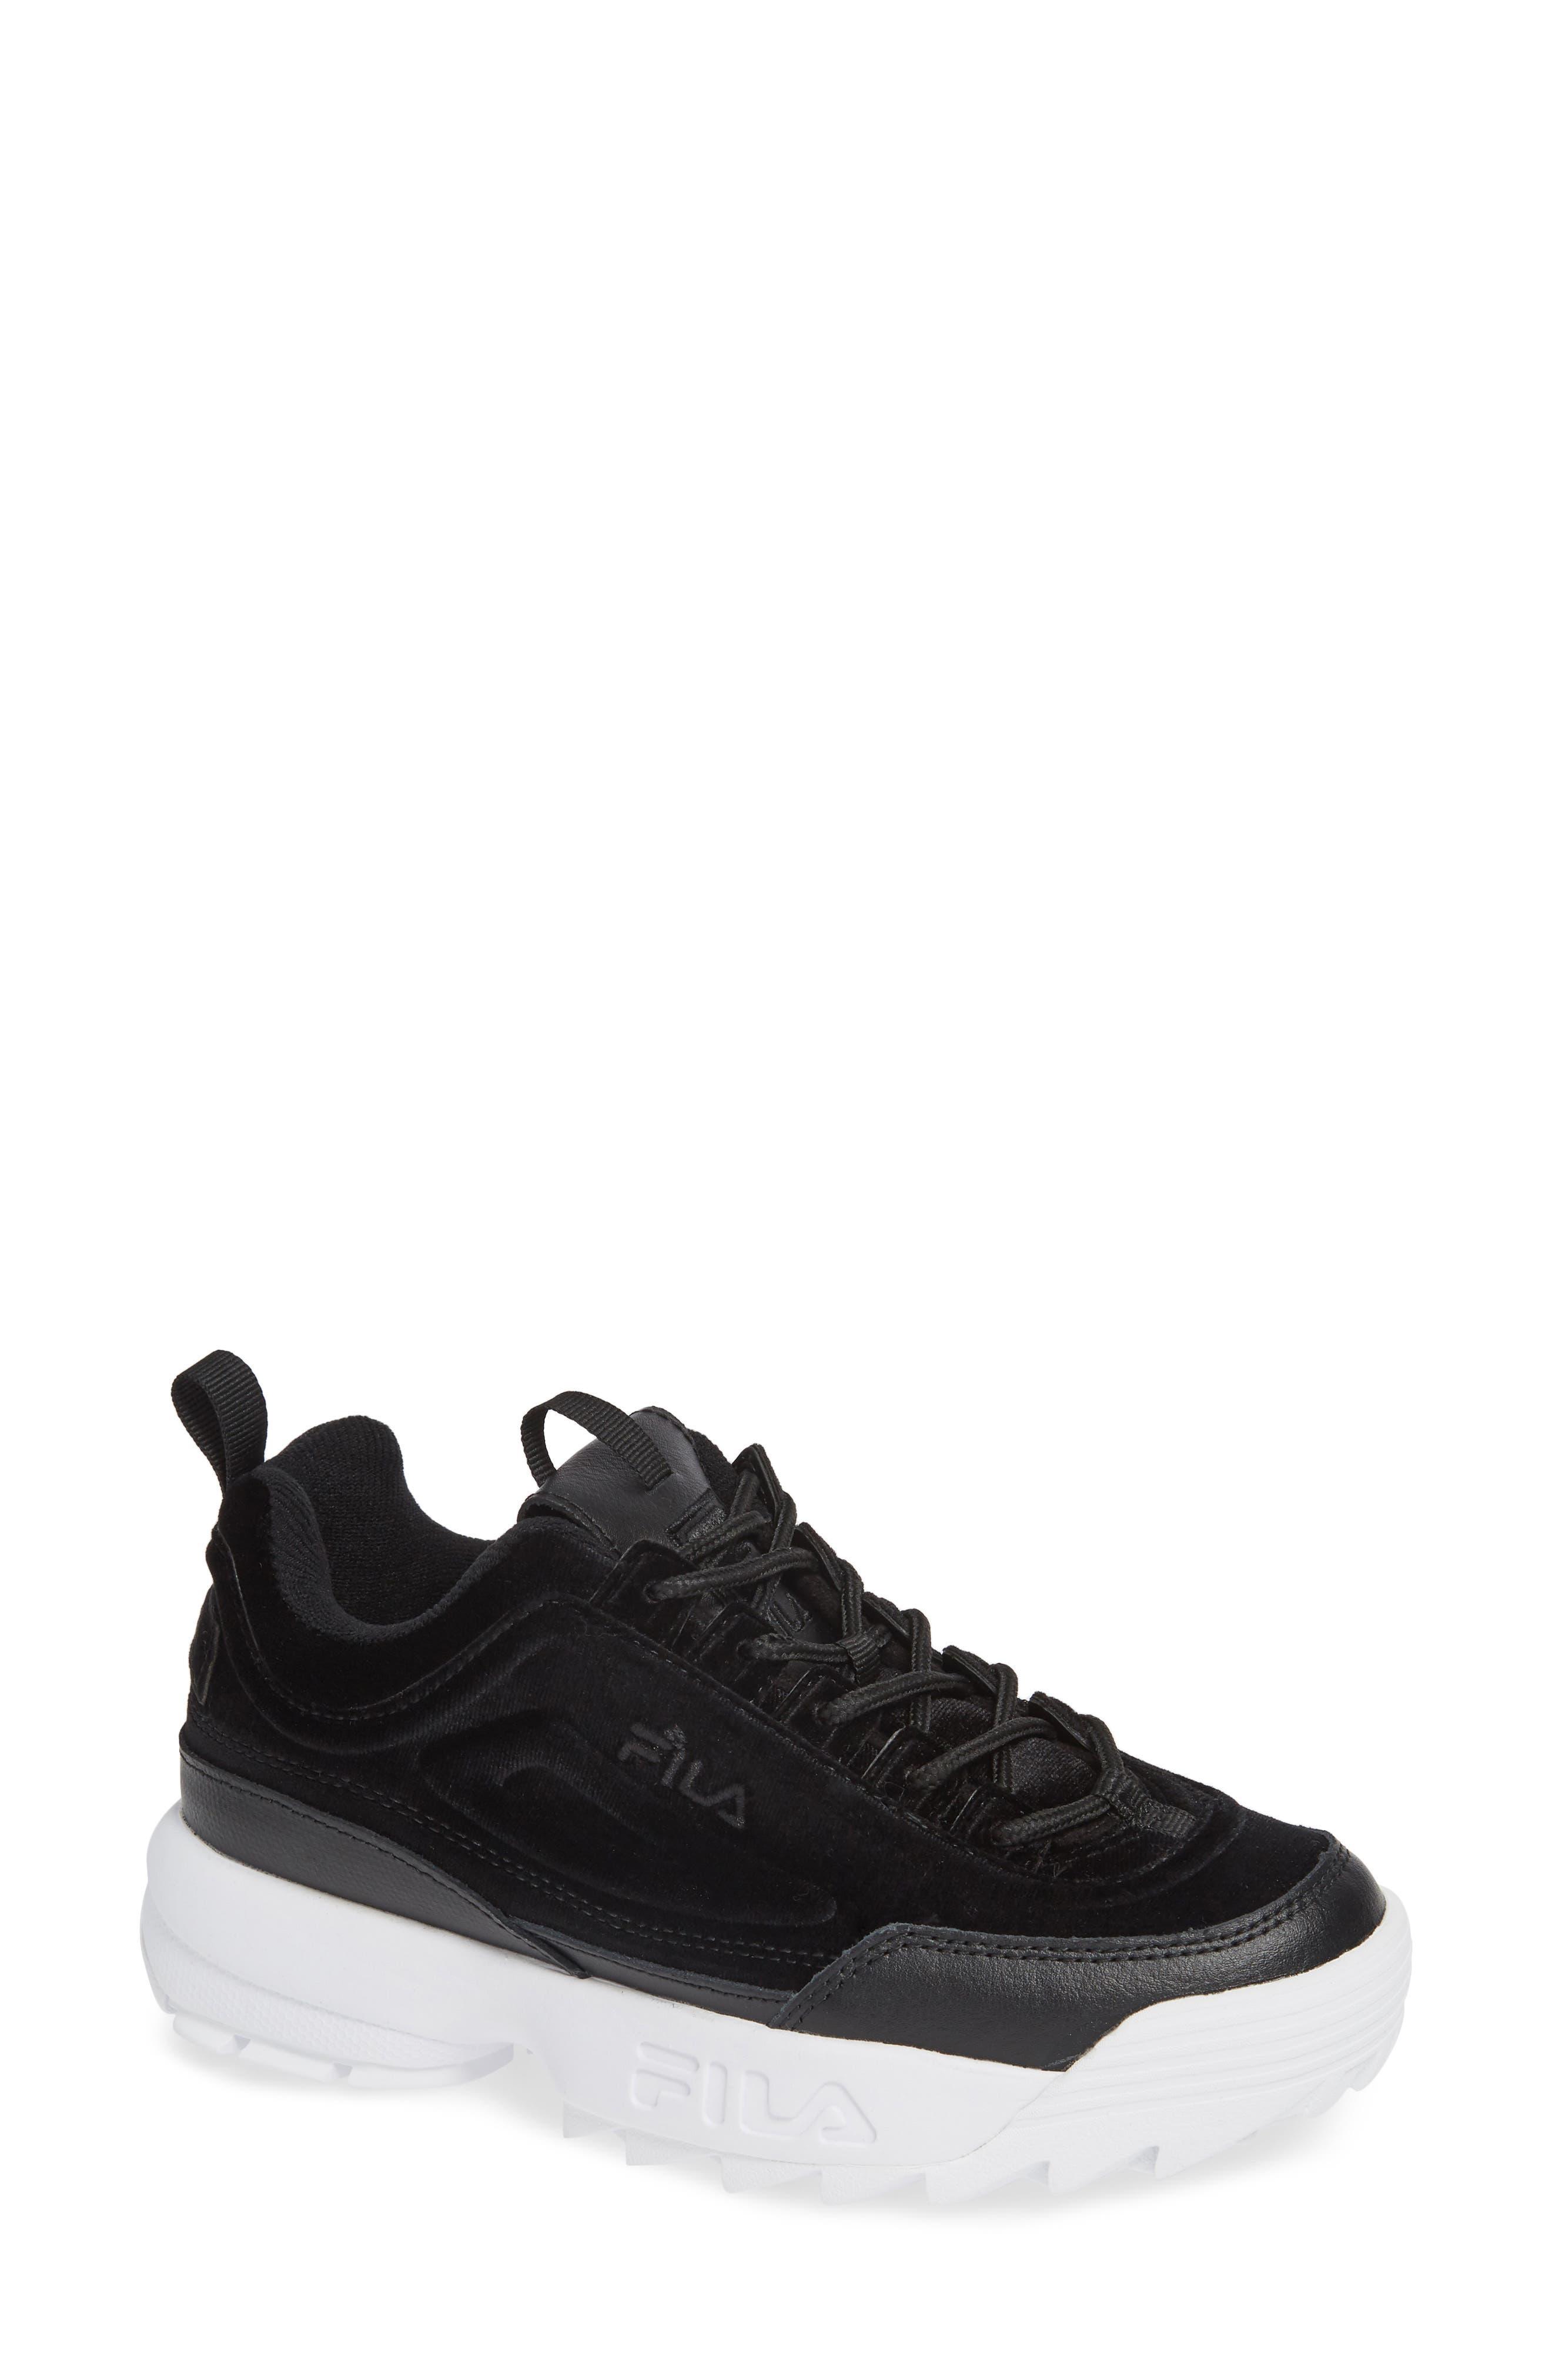 Women'S Disruptor Ii Premium Low-Top Dad Sneakers in Black/ Black/ White